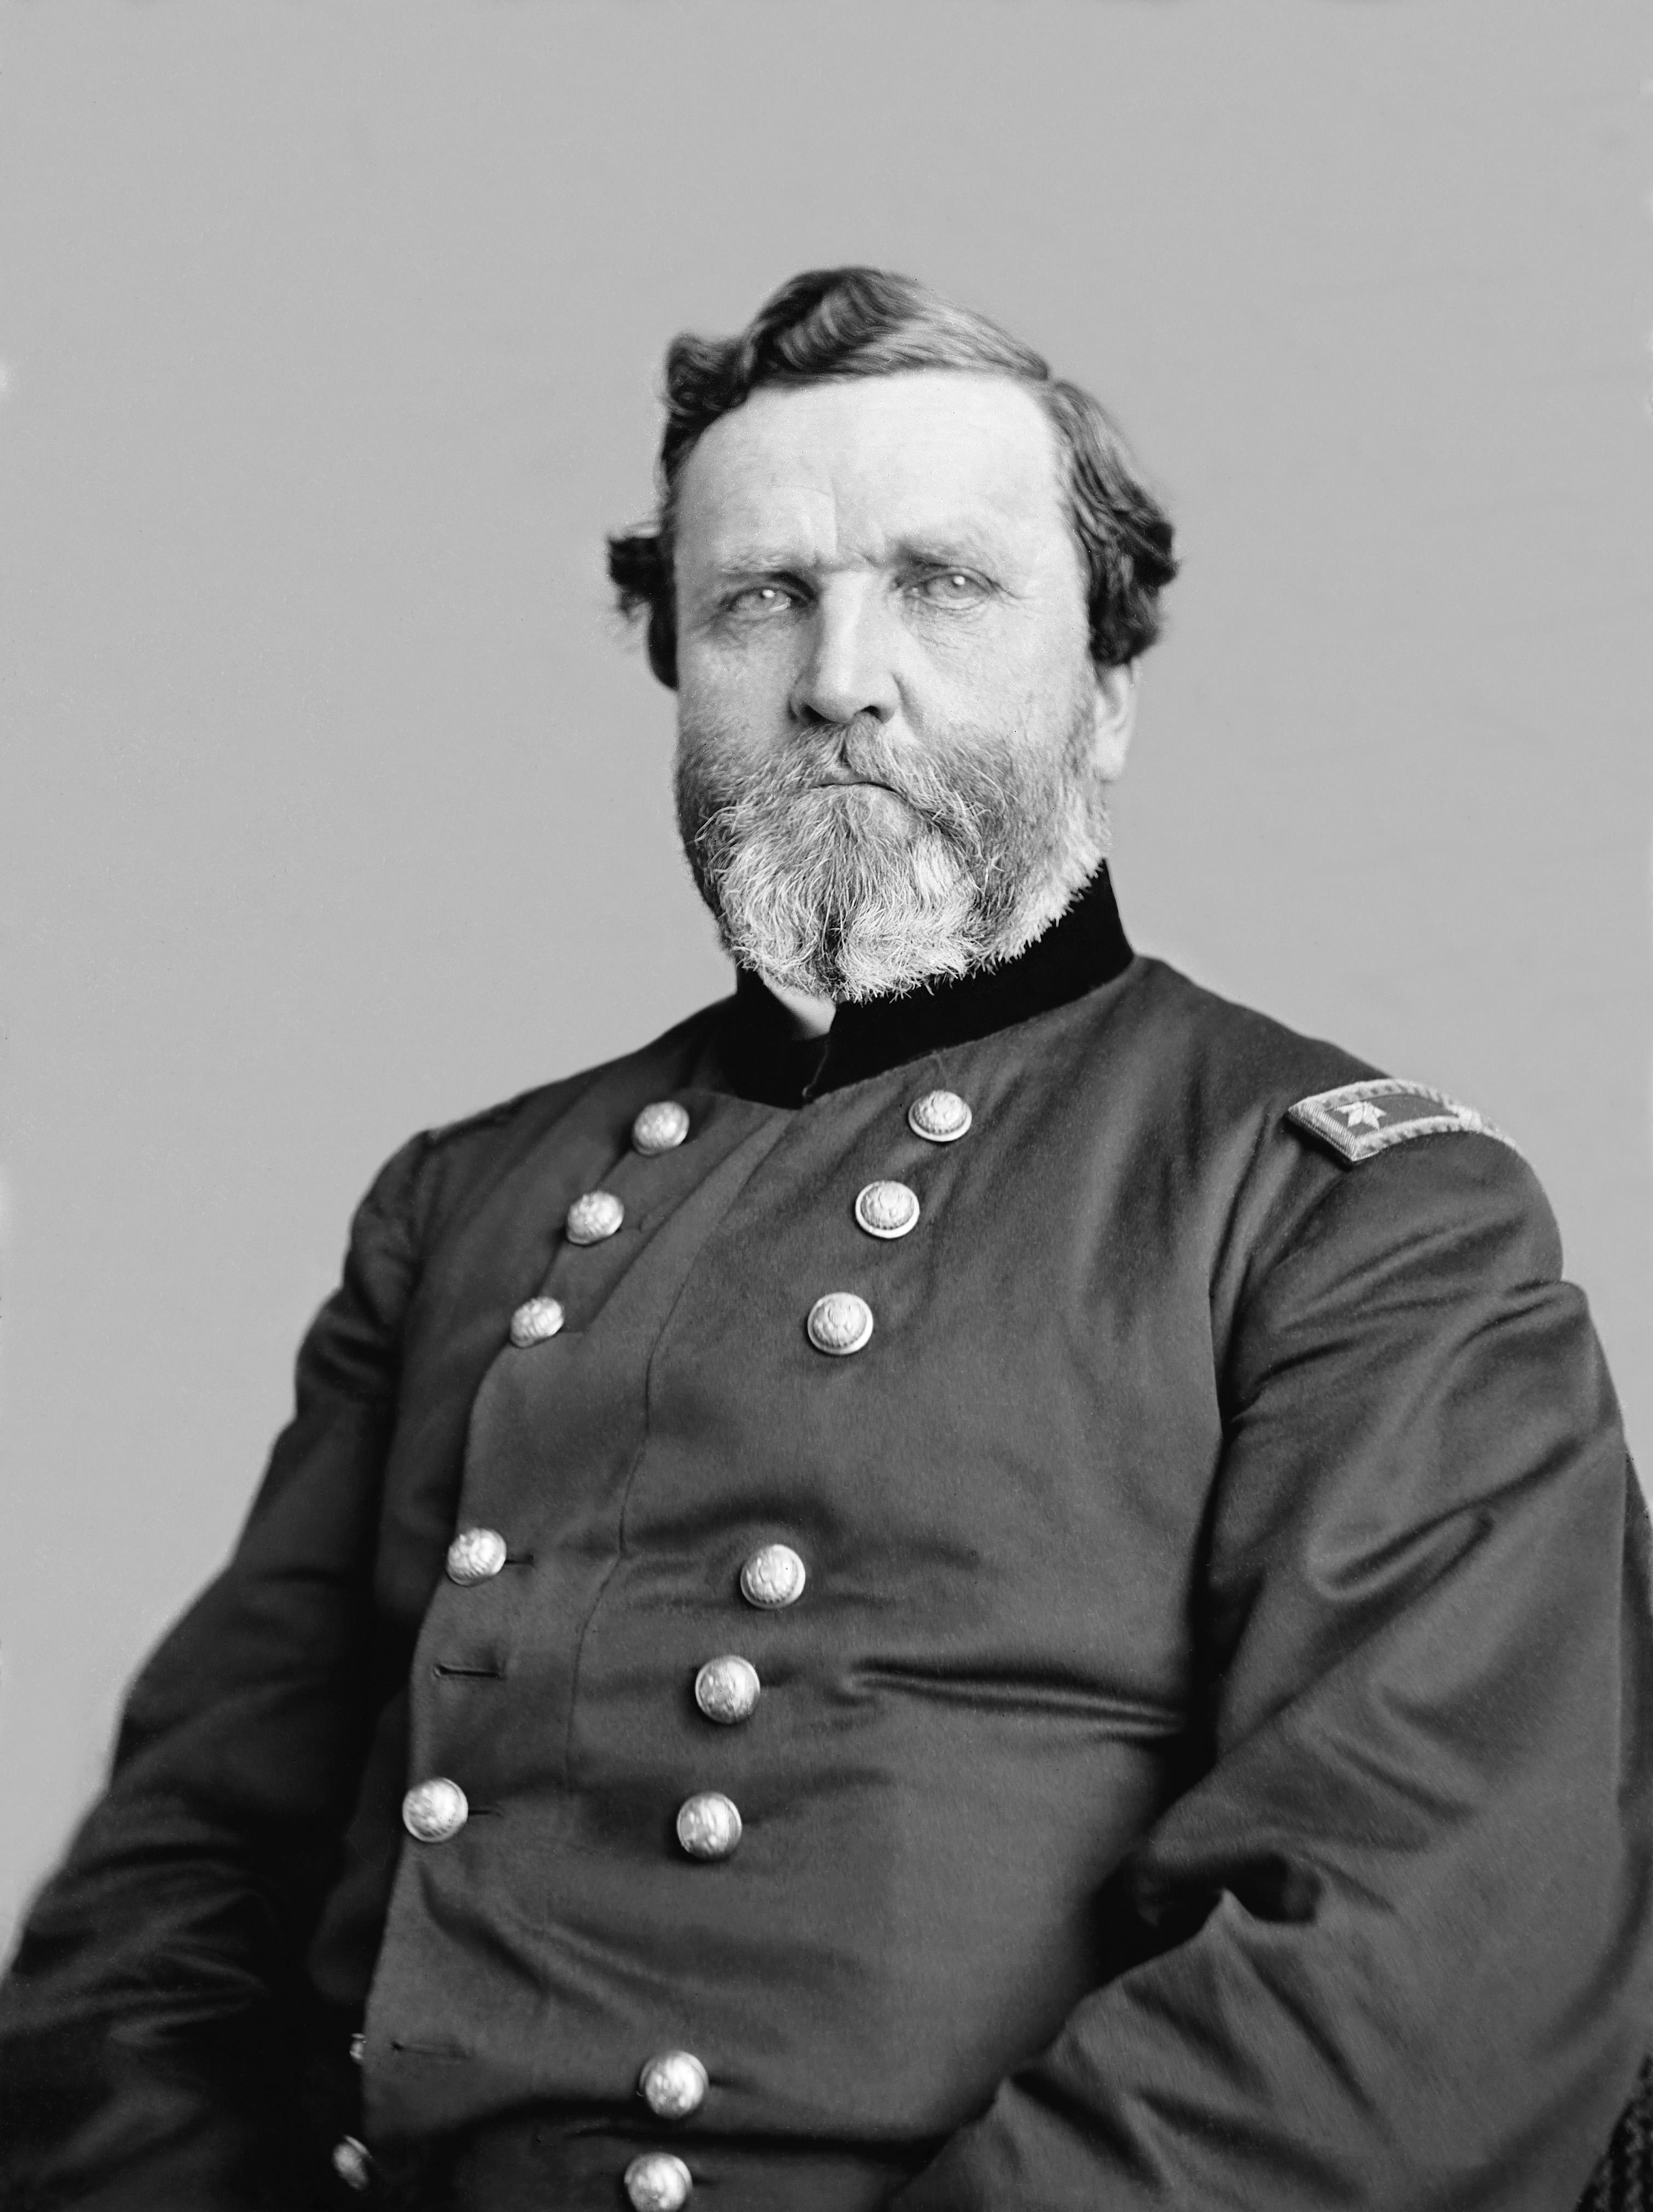 portrait of Civil War general